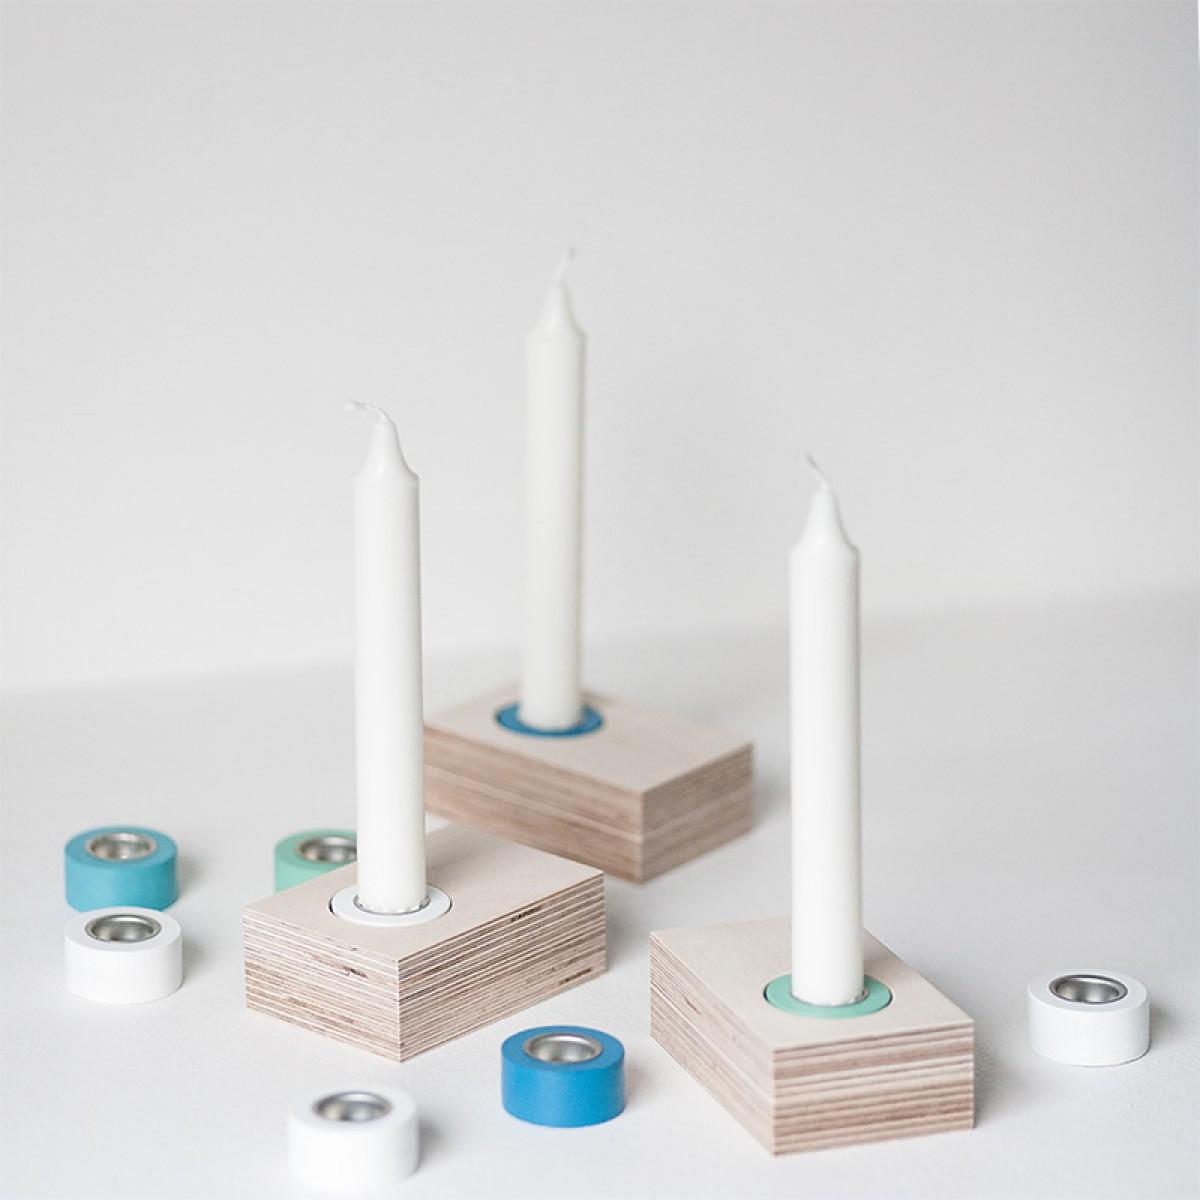 Kerzenständer Lilli - 3 weiß/blau/grün